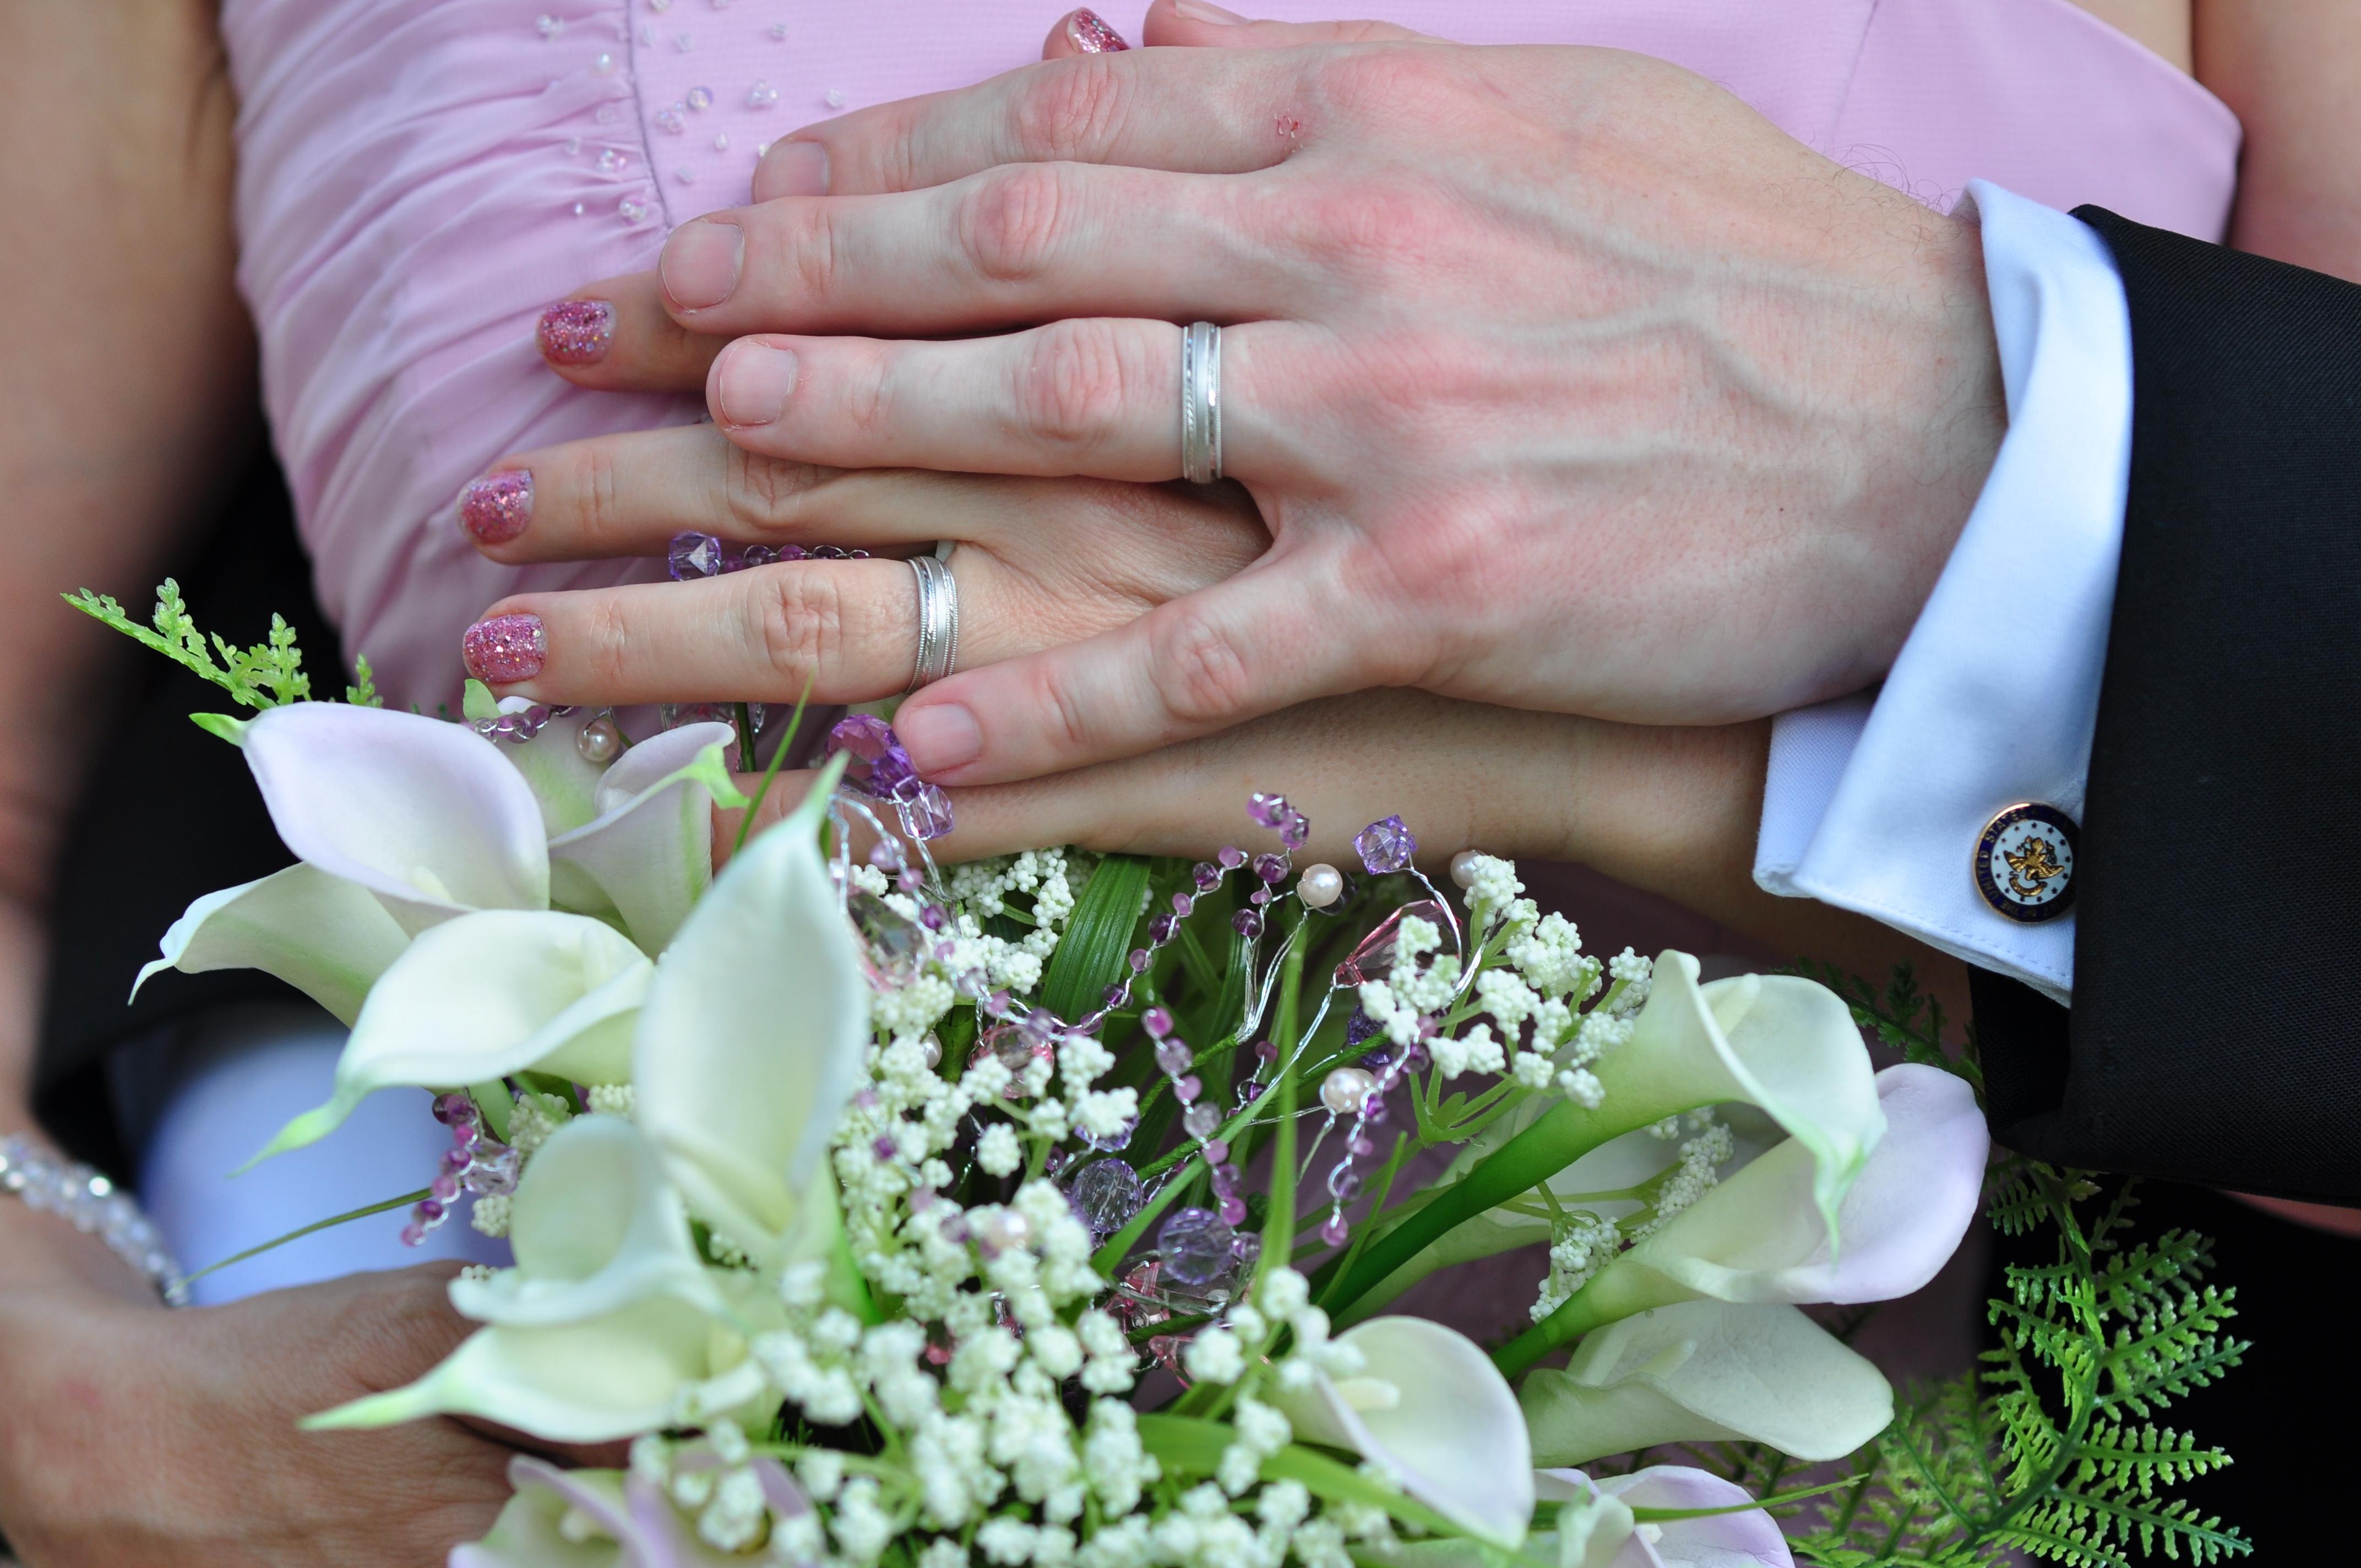 emily-and-travis-4-1-2013-april-fools-wedding-460